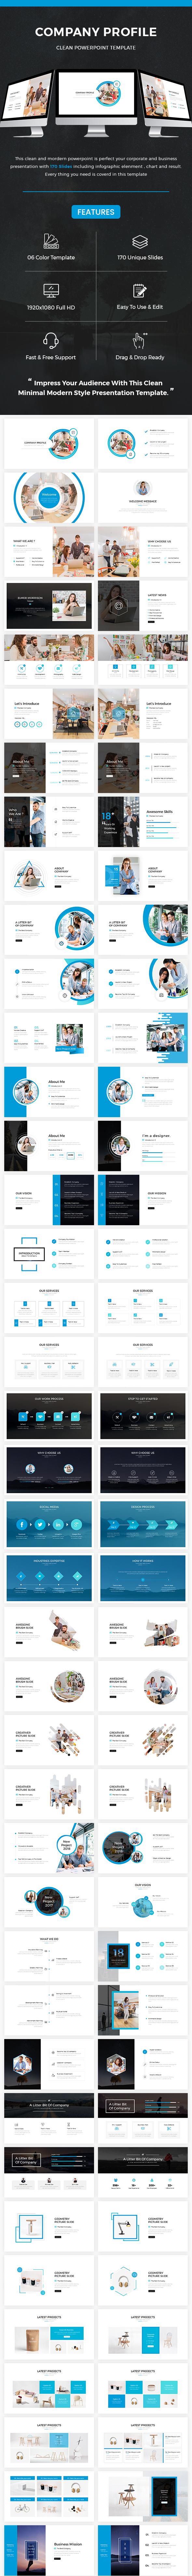 Company Profile Keynote Template 2018 - Business Keynote Templates